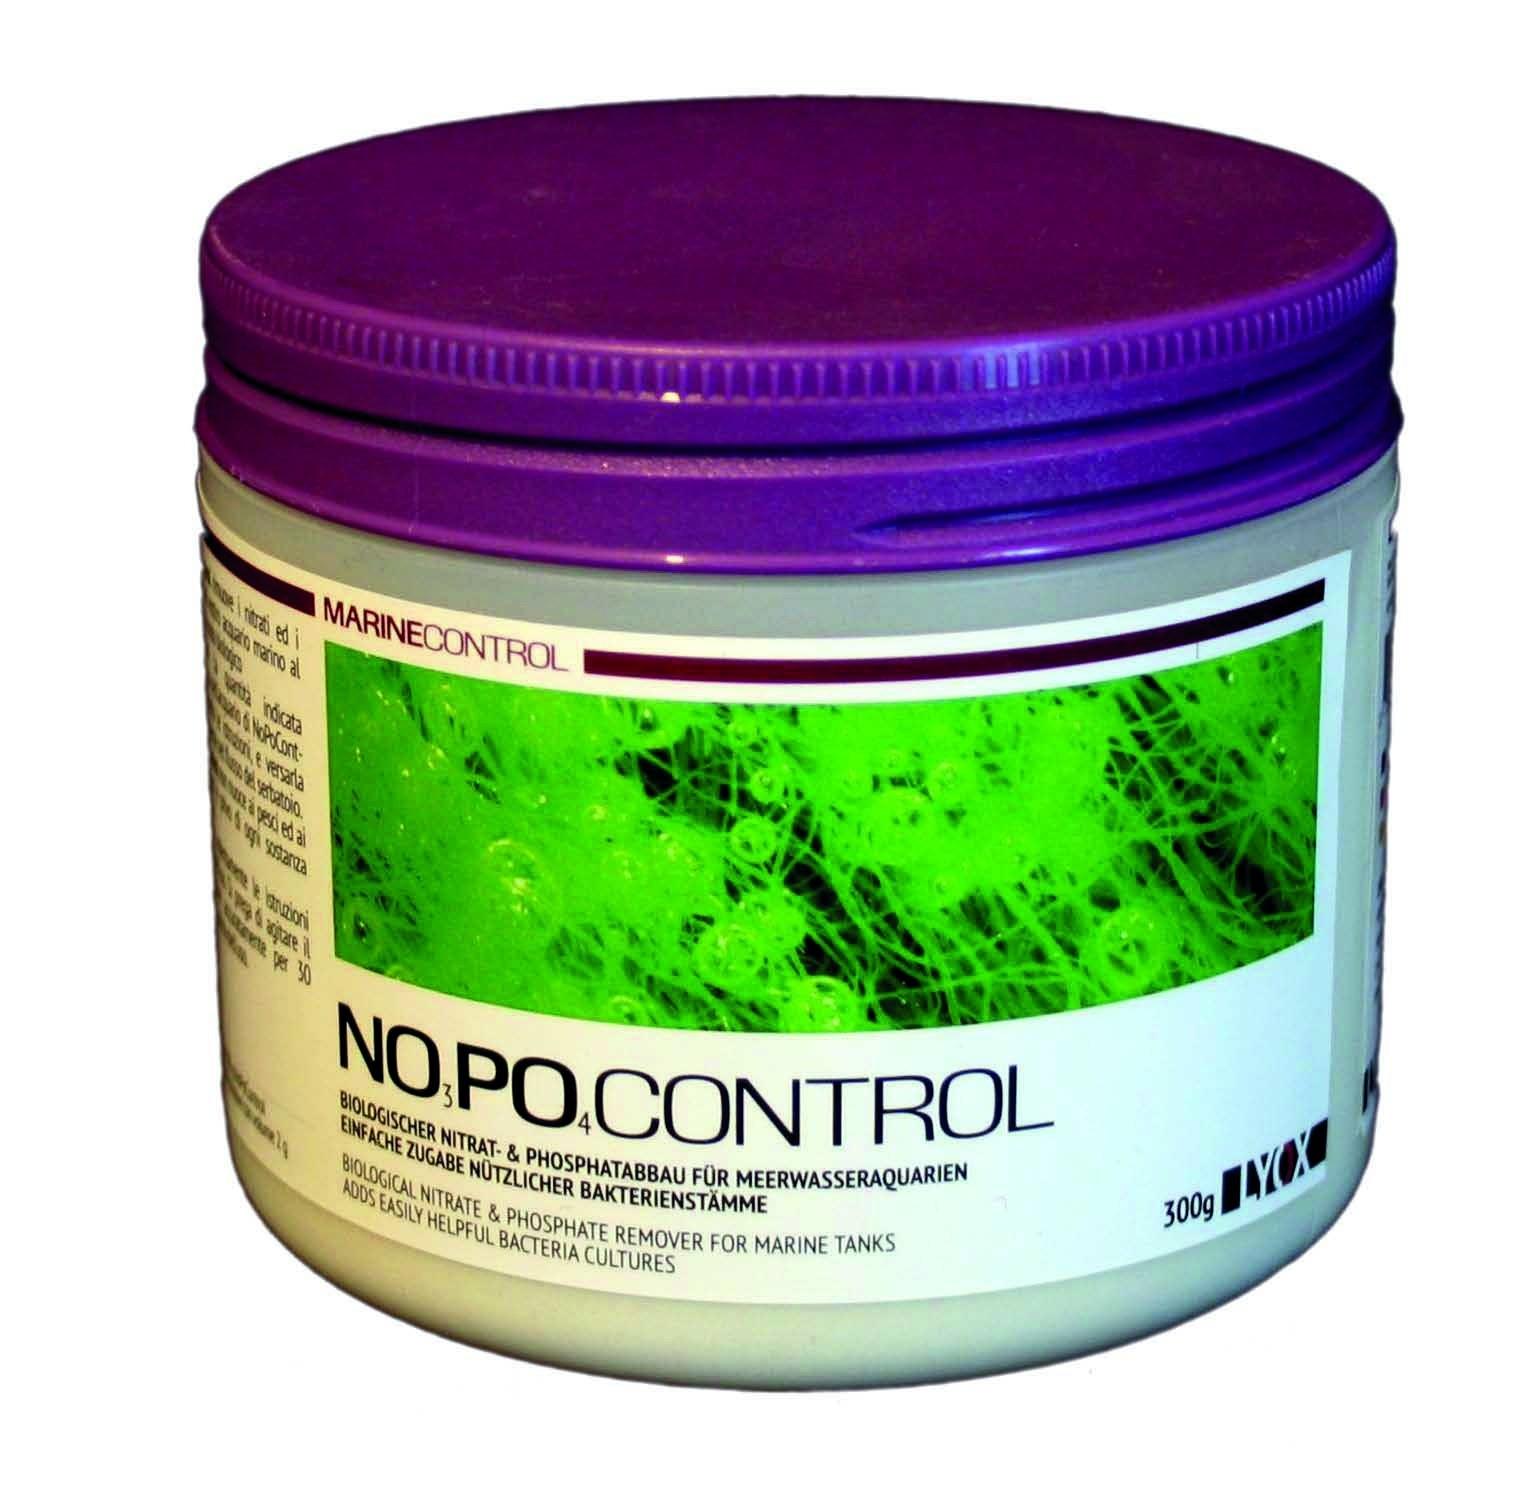 NoPo Control